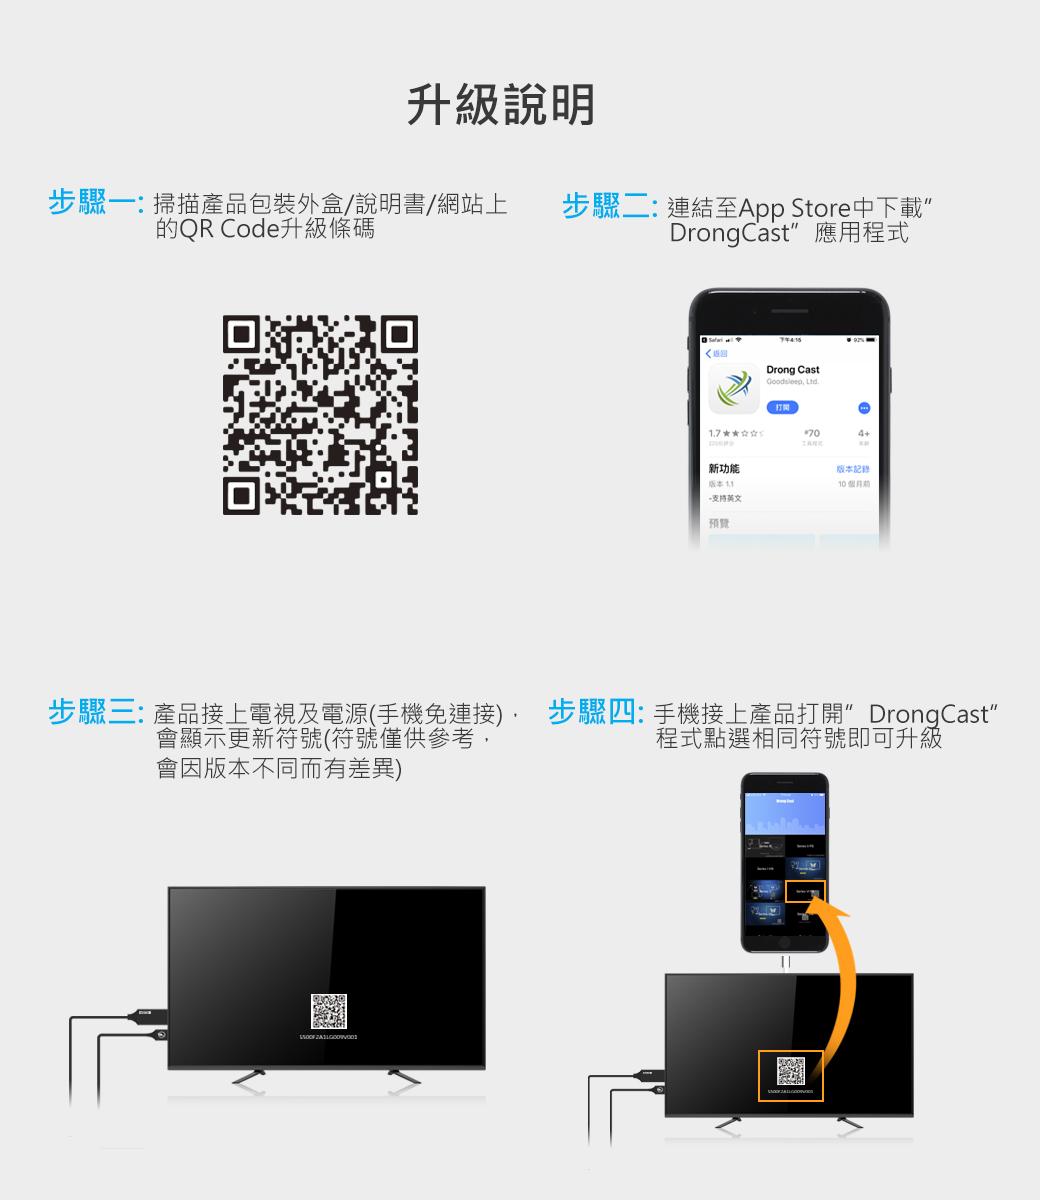 PChome Online 商店街- PChome 24h購物- DIKE DAO620A HDMI高畫